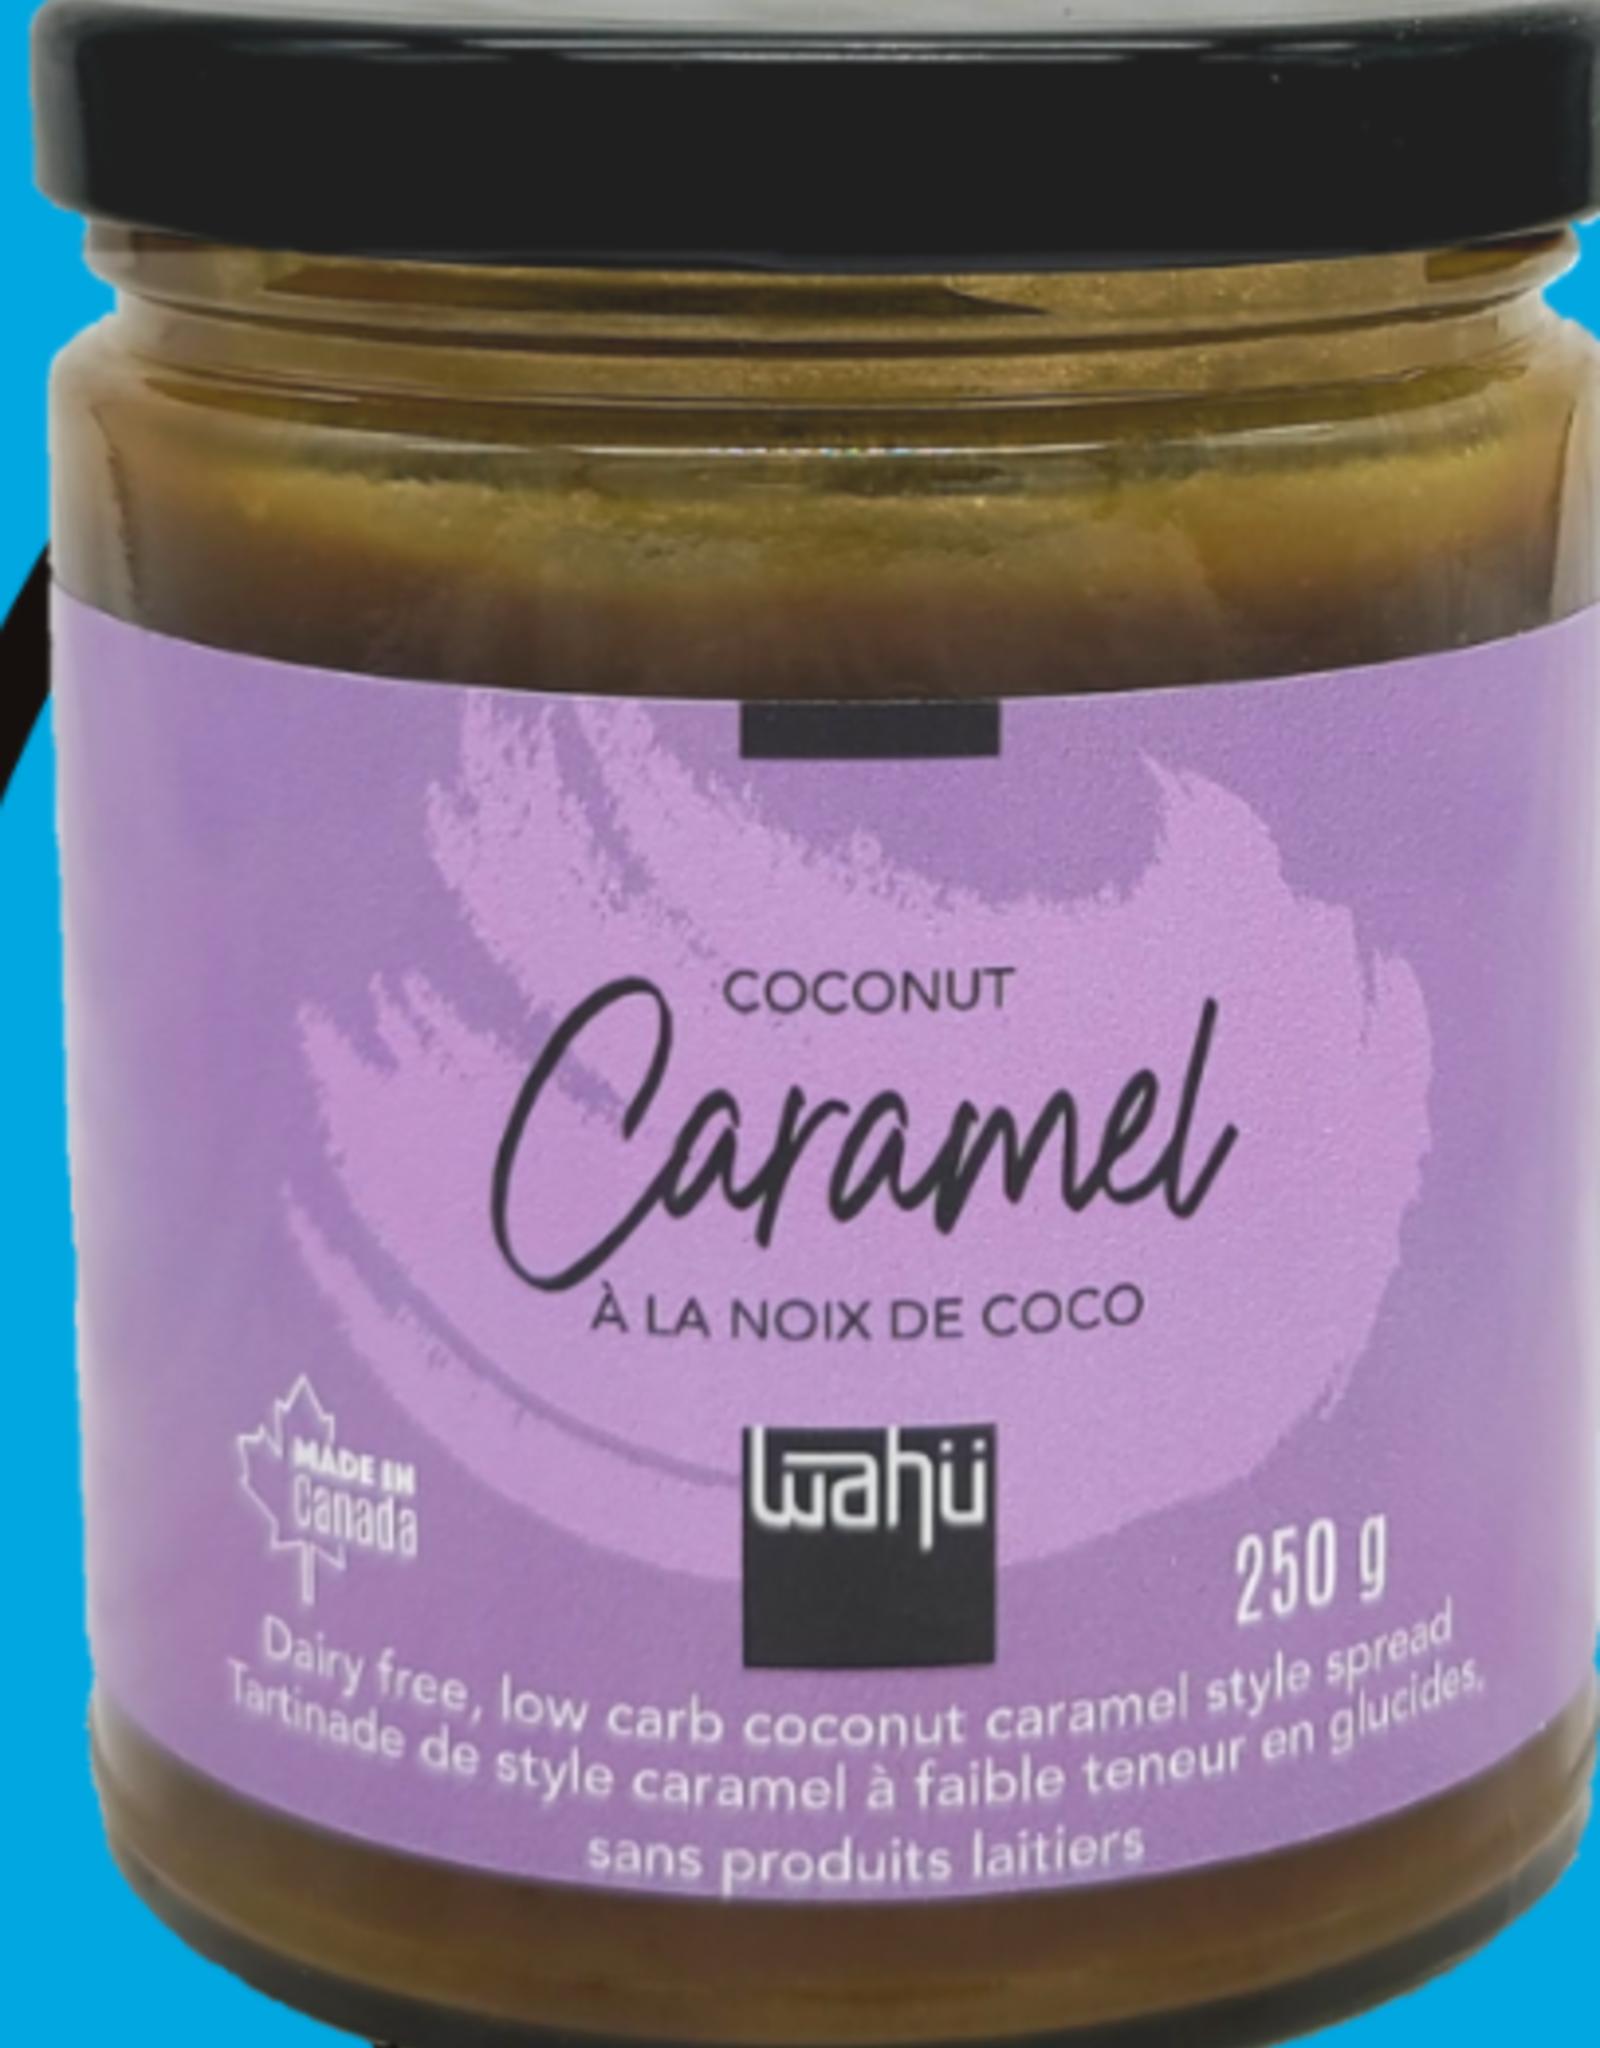 Wahu - Coconut Caramel